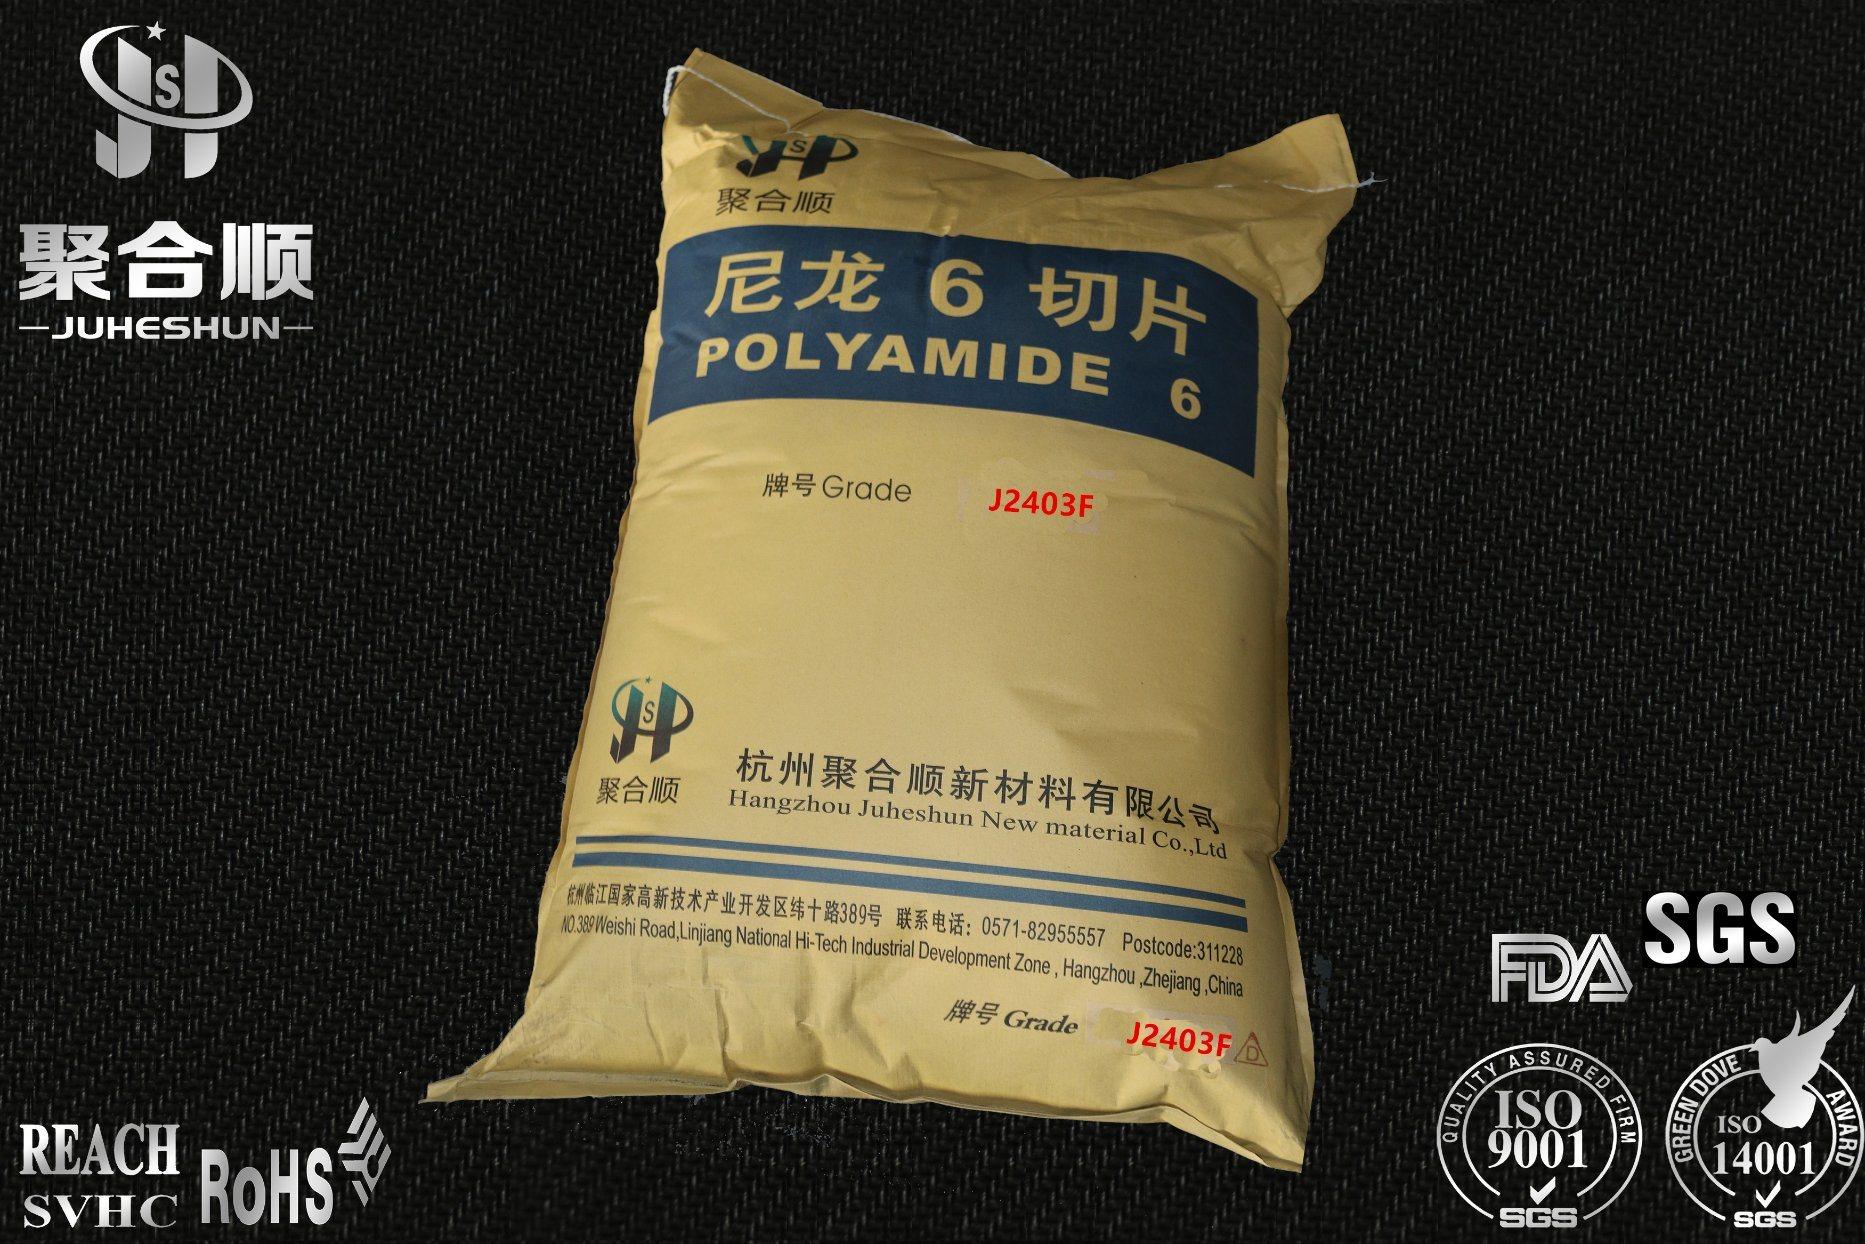 J2403f/Civilian Spinning Grade /PA6/Nylon/Polyamide Granules/Pellets/Chips/PA6 Raw Material